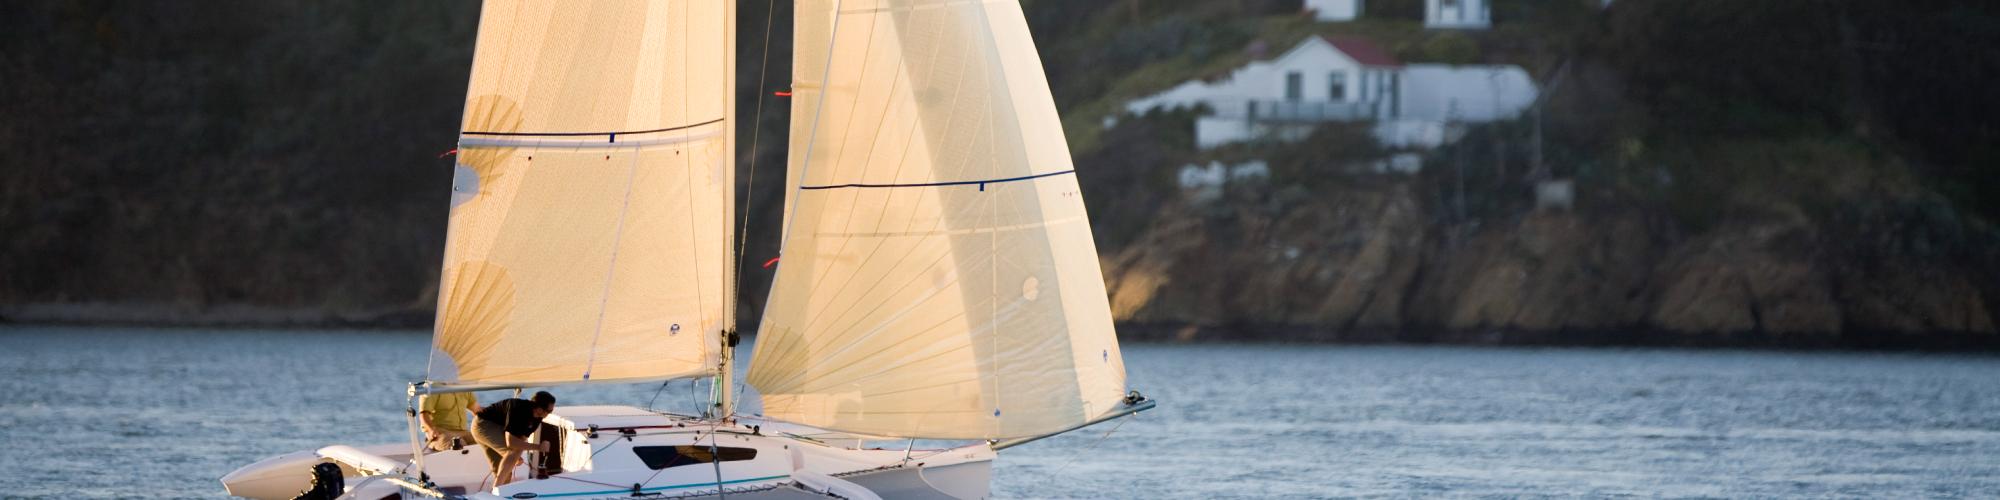 sails-furling-page-banner-image1